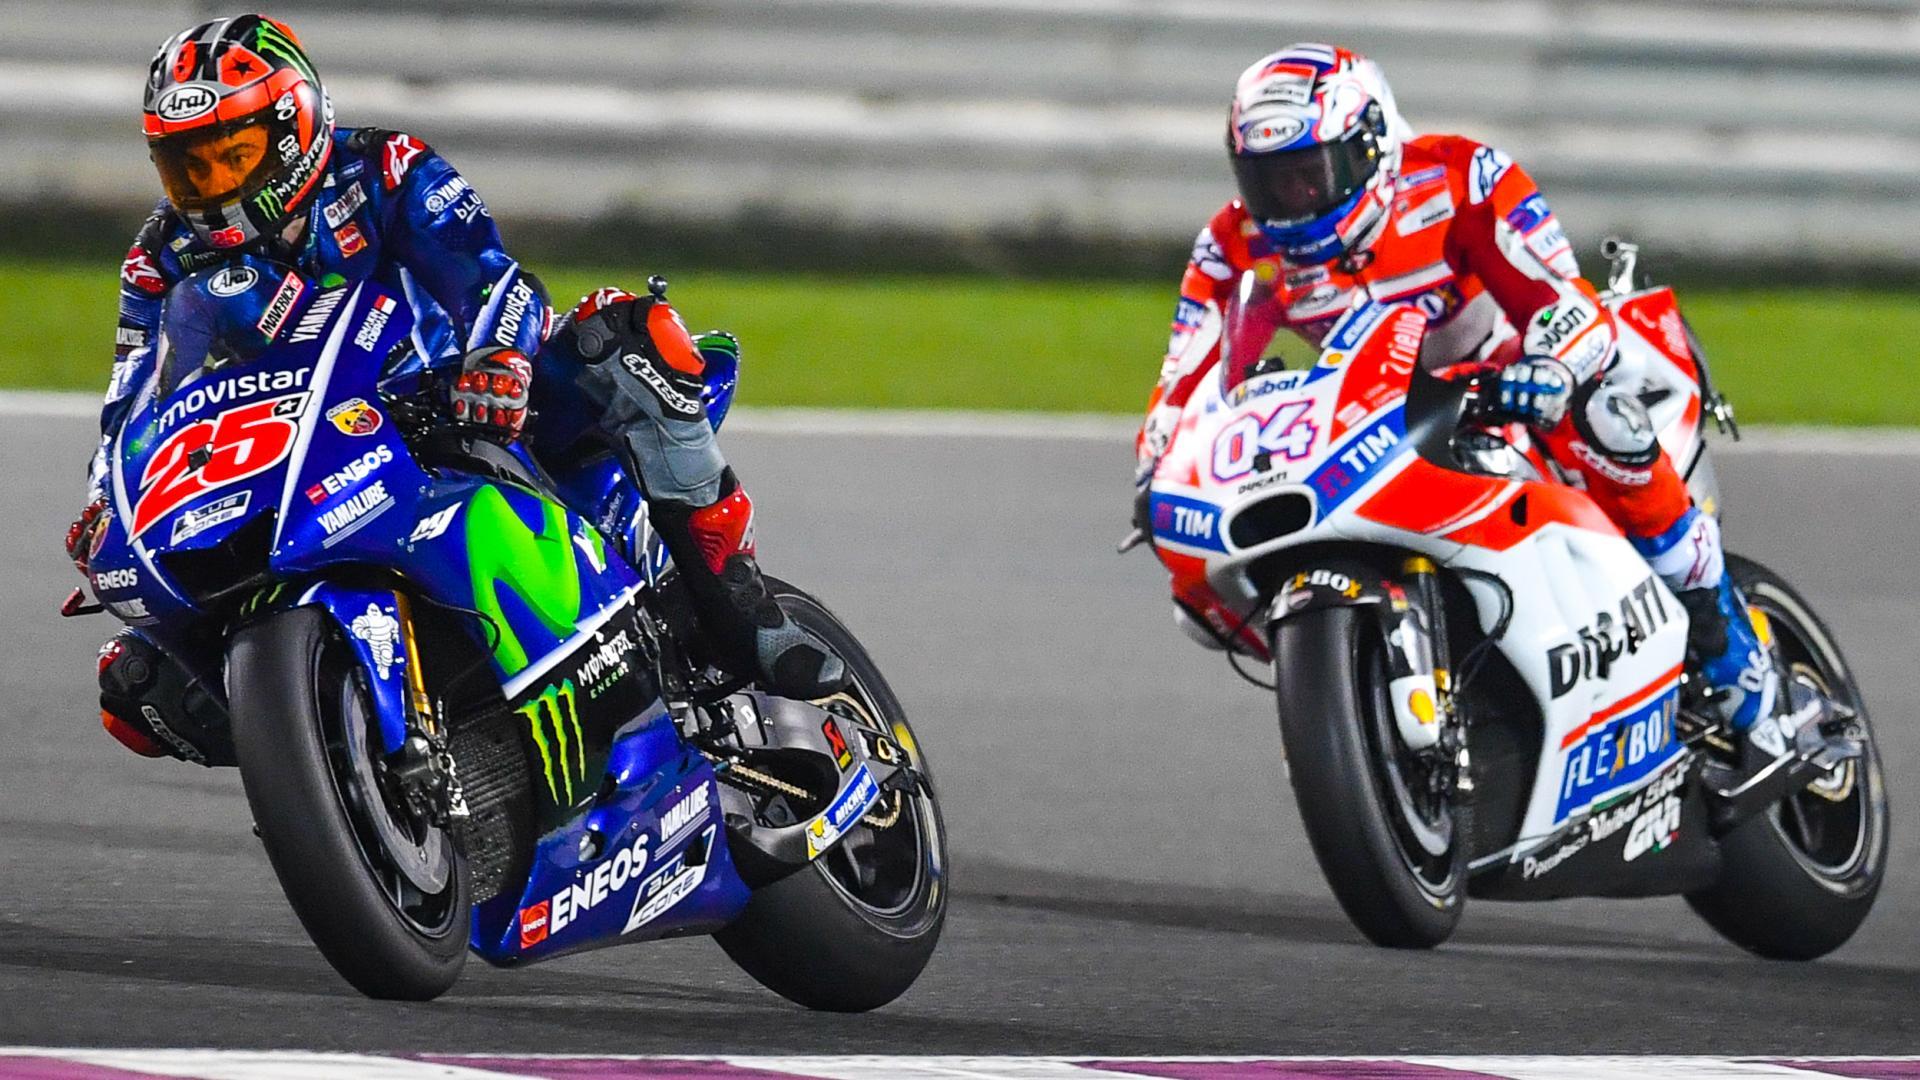 MOTO GP 2019 COMPÉTITIONS - Page 3 04-andrea-dovizioso-ita-25-maverick-vinales-esplg5_5954.topcontent_fullhd